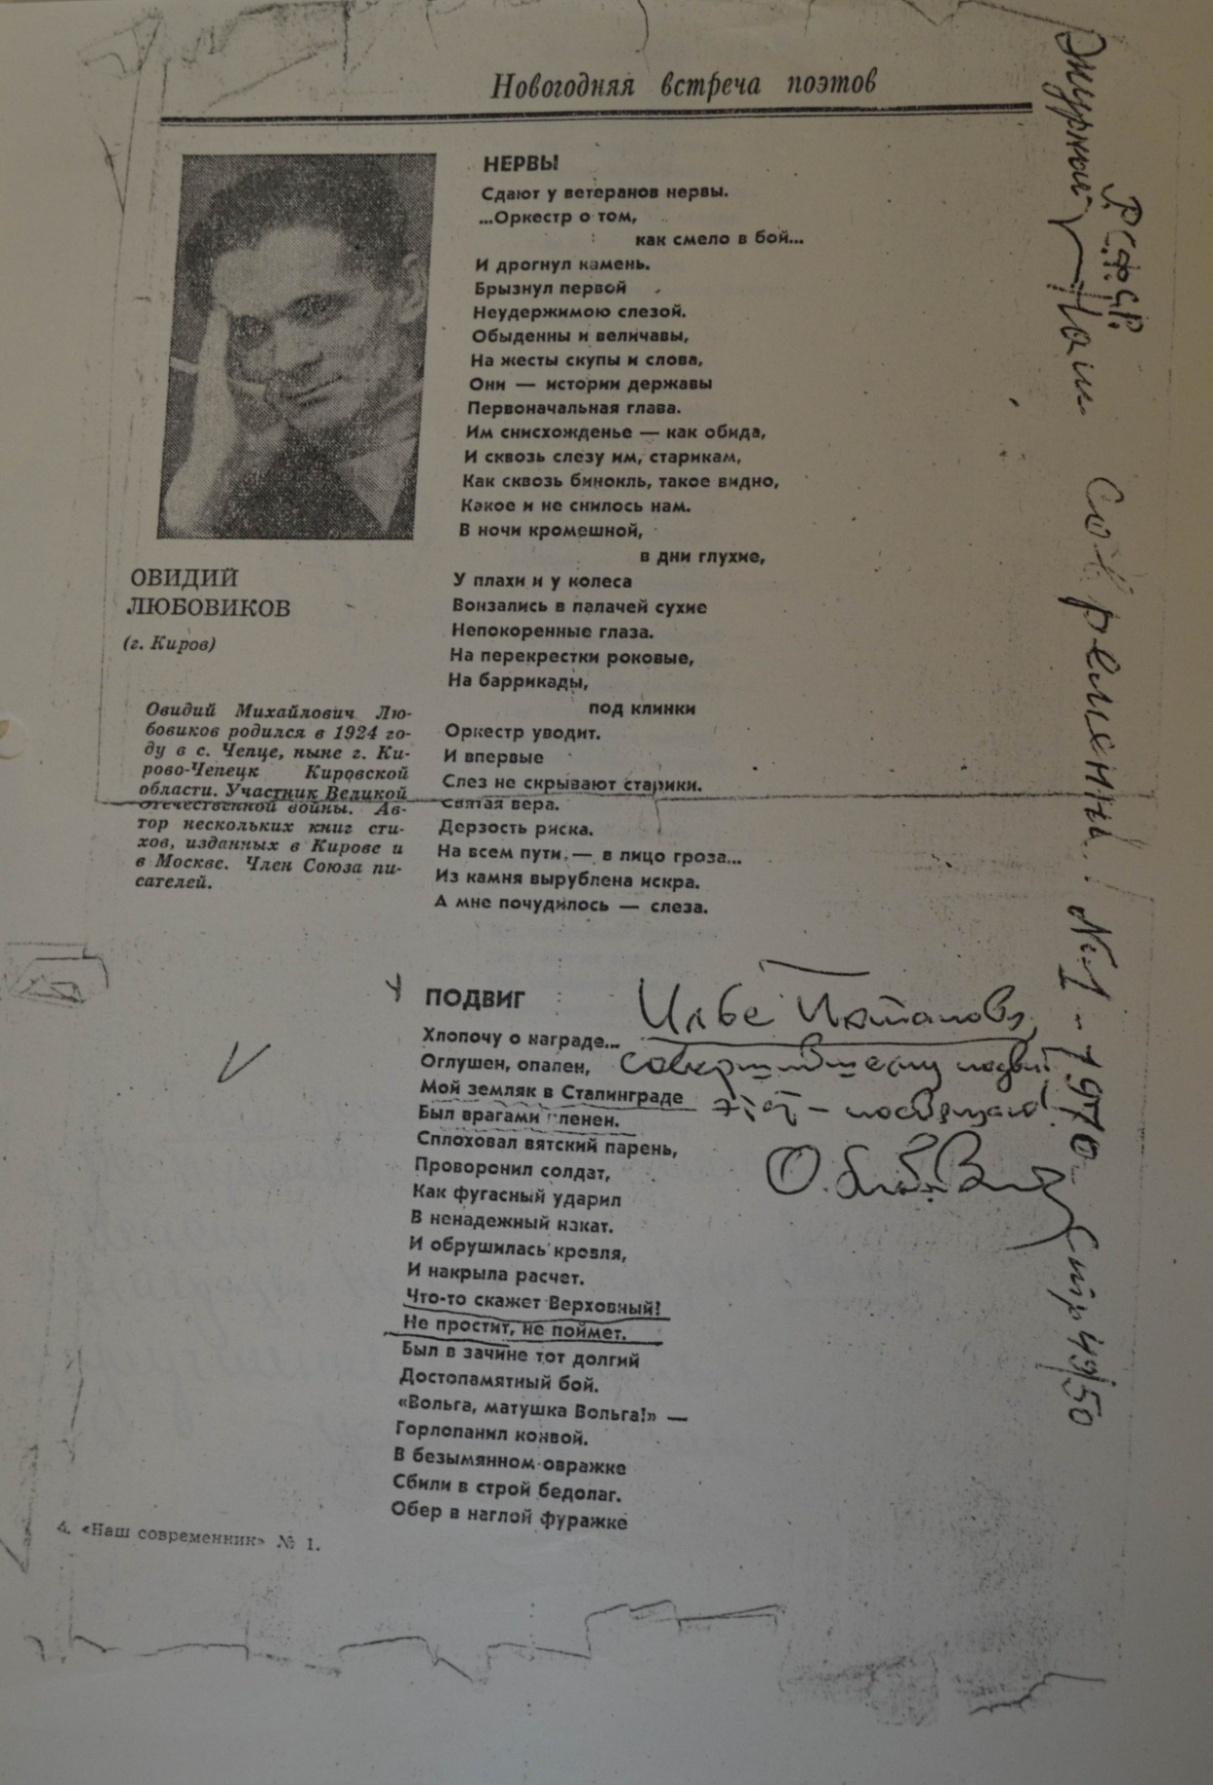 C:\Documents and Settings\Миша\ПРОЕКТЫ\РАБОТА О ДЕДУШКЕ\фото из музея\0025.jpg